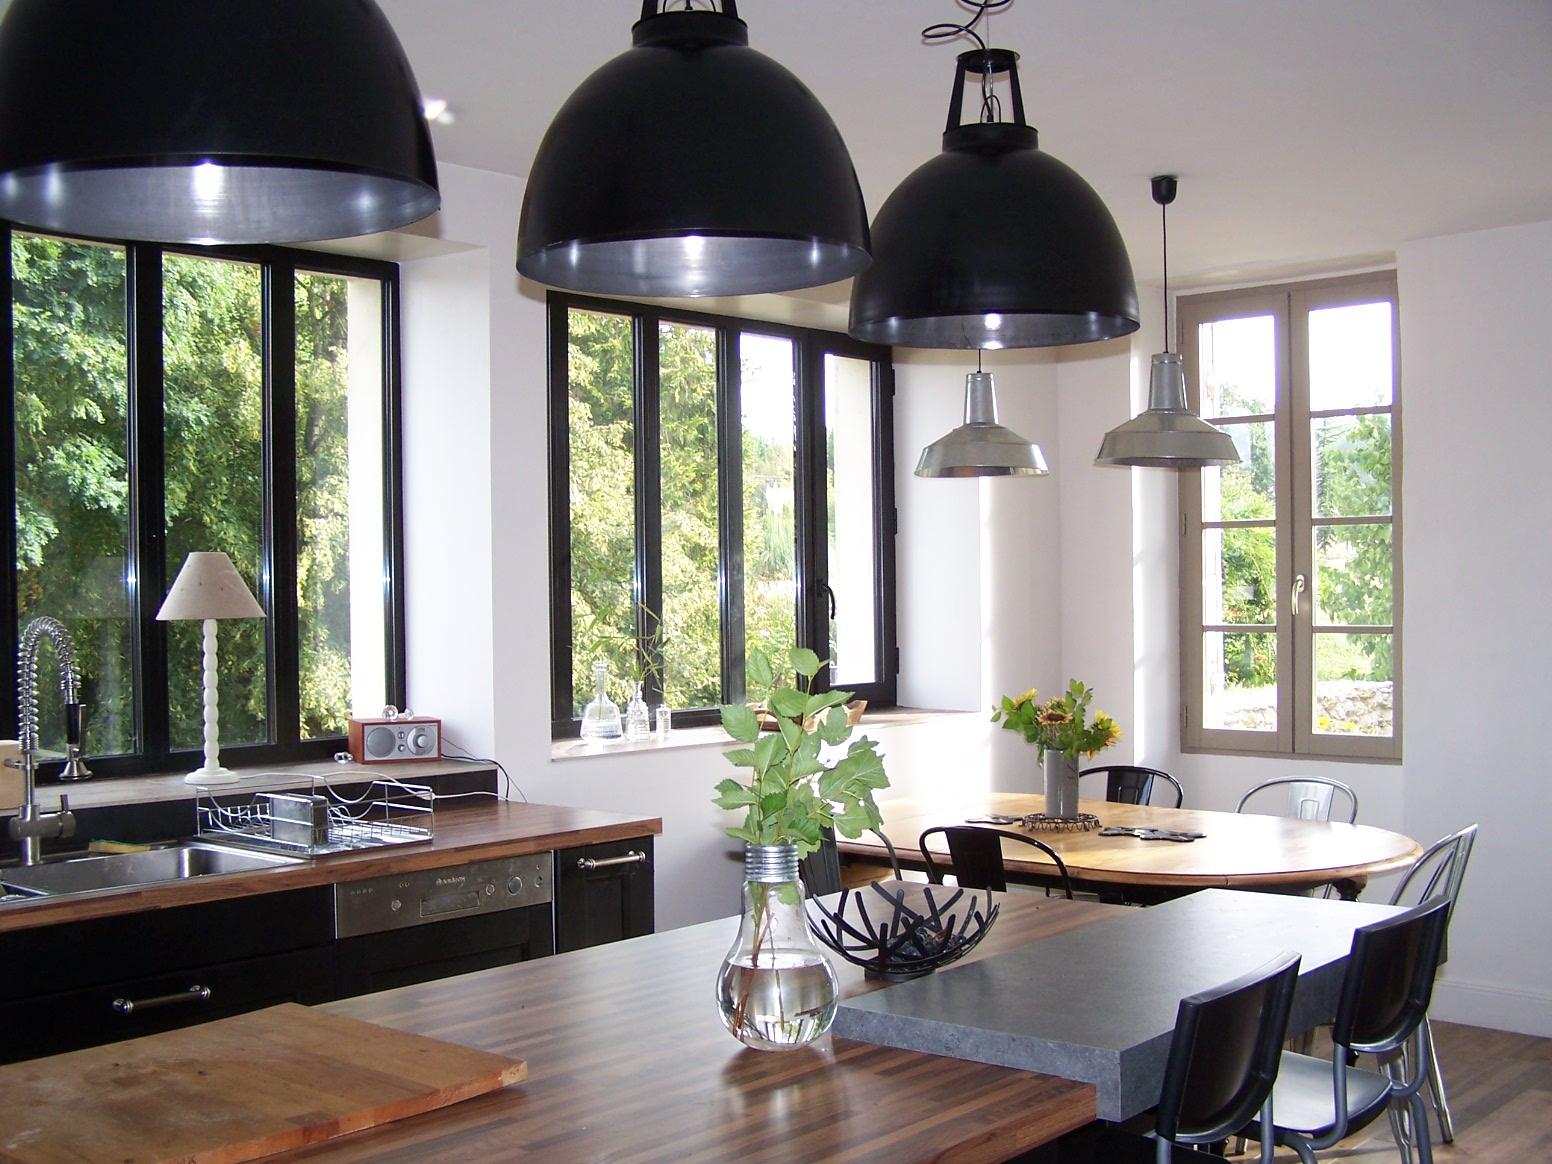 cuisine maison ancienne landes 40 saurin decoration. Black Bedroom Furniture Sets. Home Design Ideas